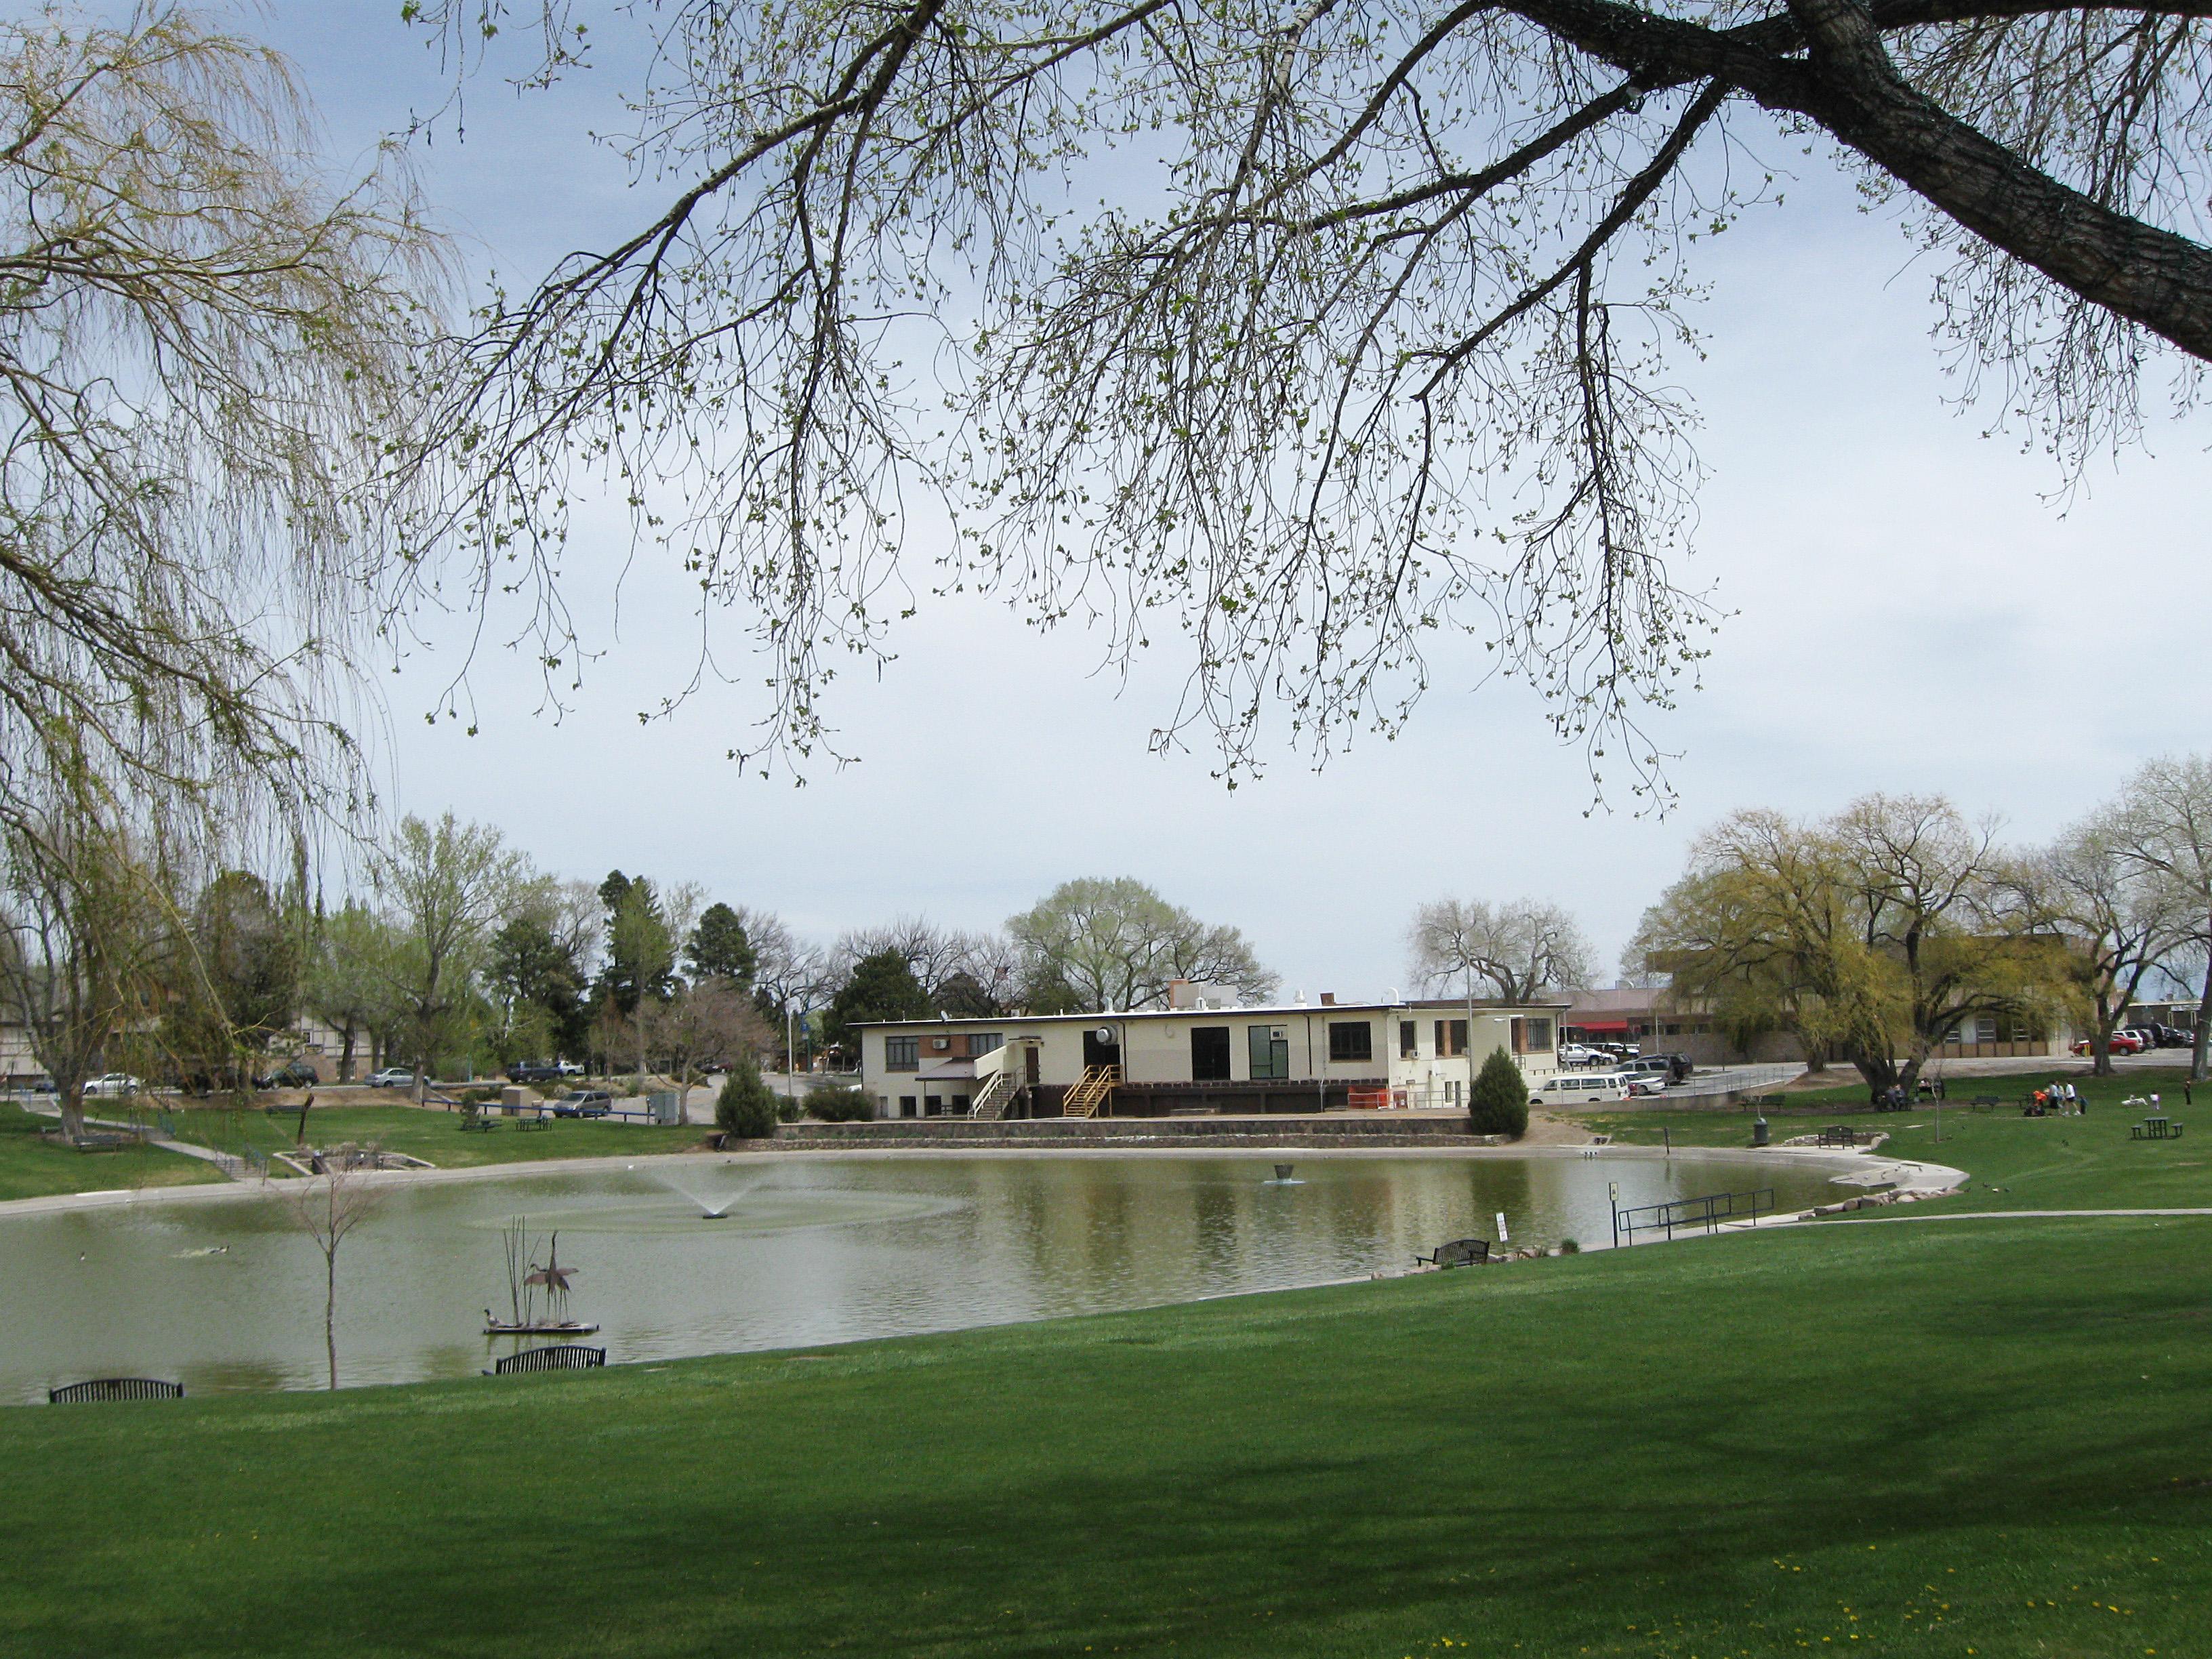 New mexico los alamos county los alamos - File Los Alamos New Mexico Ashley Pond Park Jpg